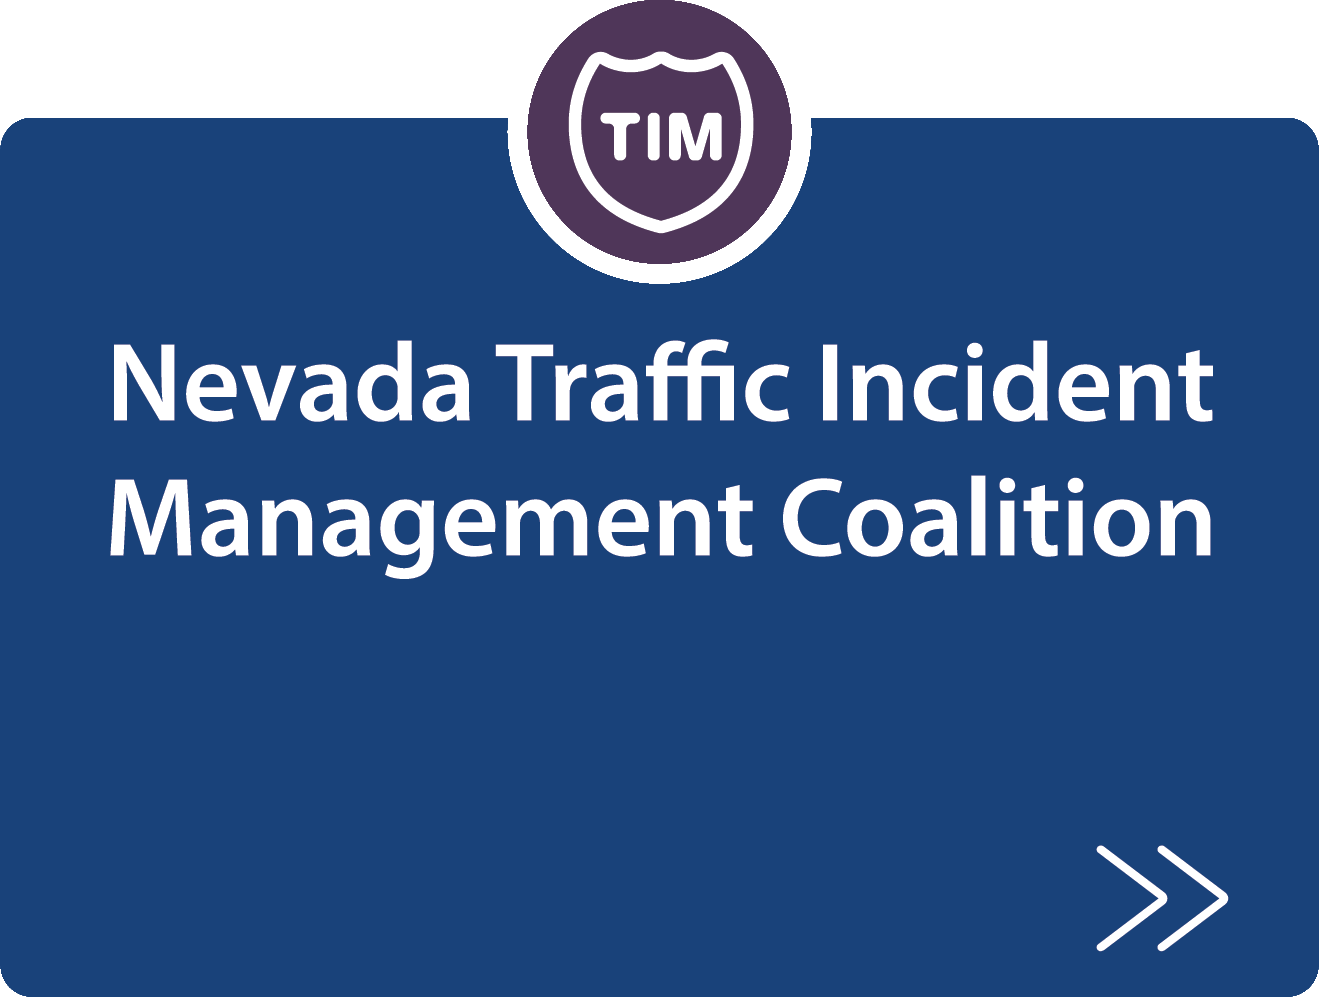 Nevada Traffic Incident Management Coalition strategy description